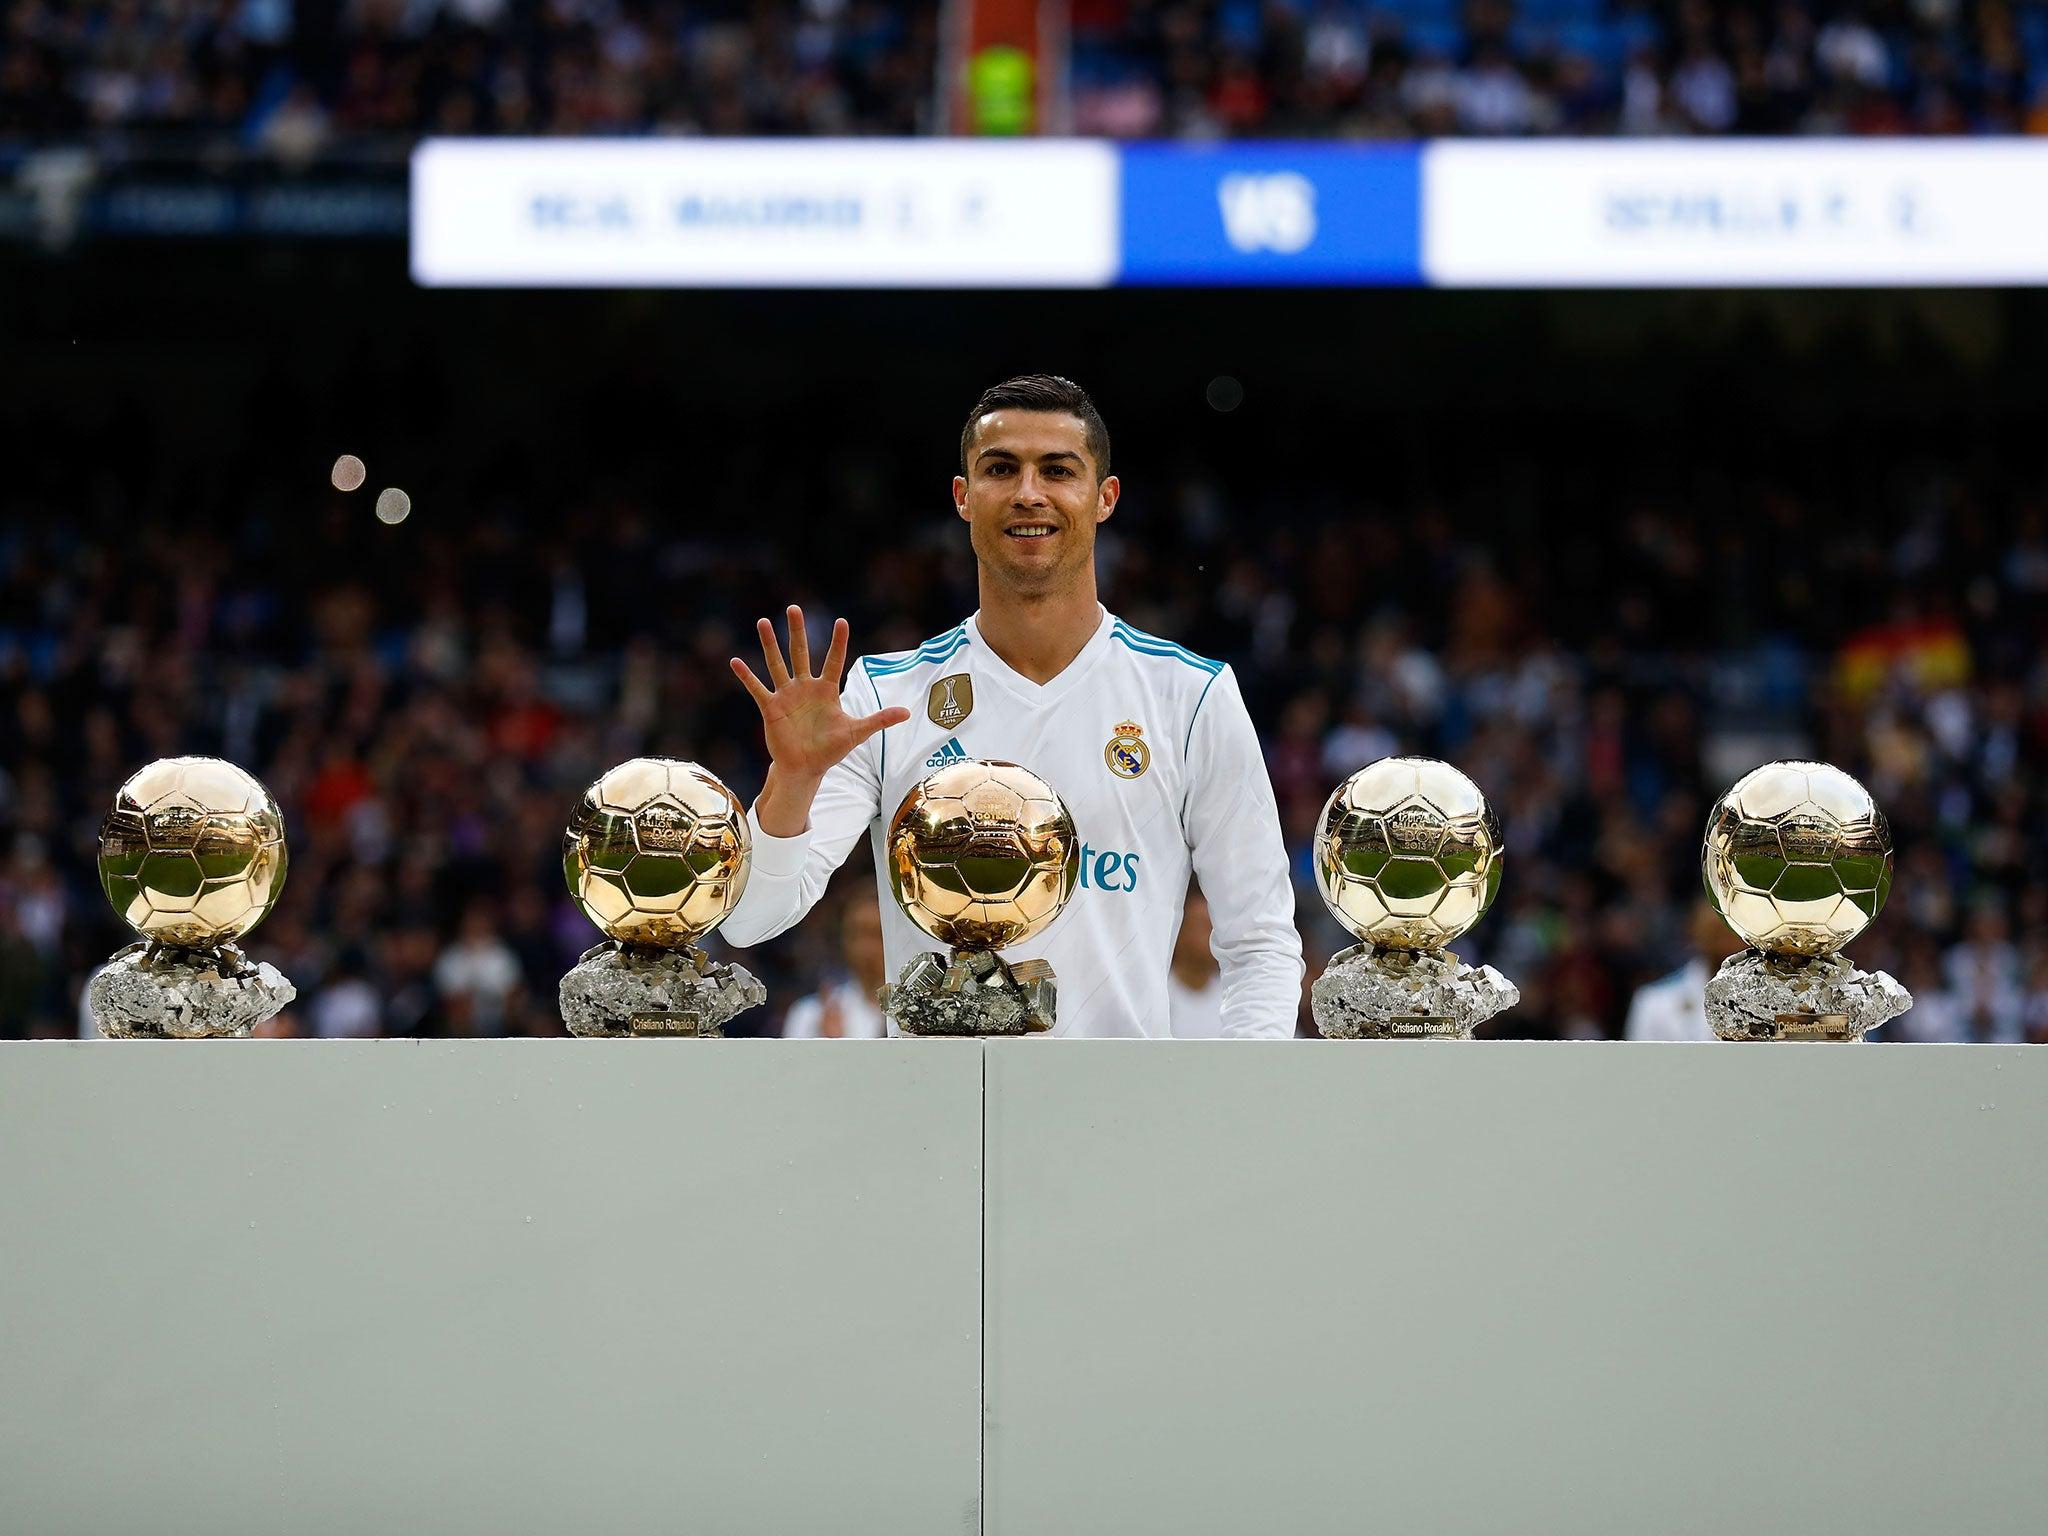 Real Madrid forward Cristiano Ronaldo to build children's hospital in Chile